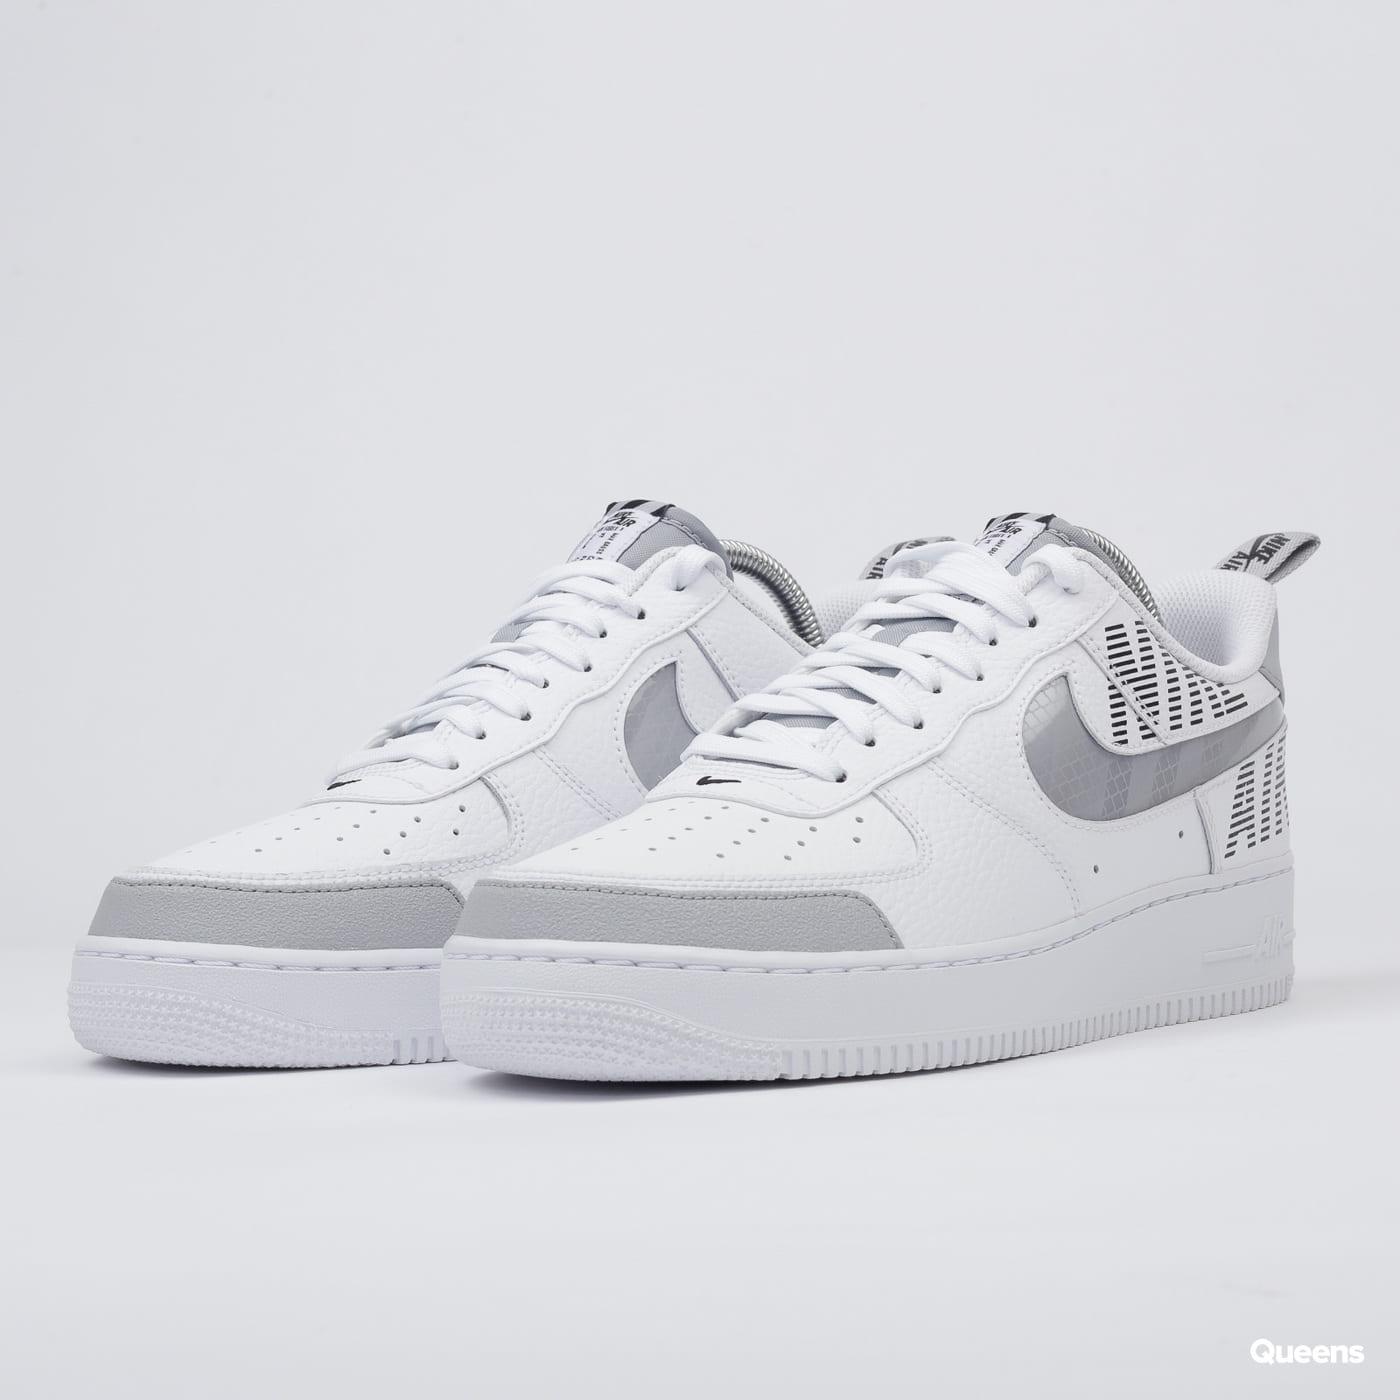 Nike Air Force 1 '07 LV8 2 white / wolf grey - black